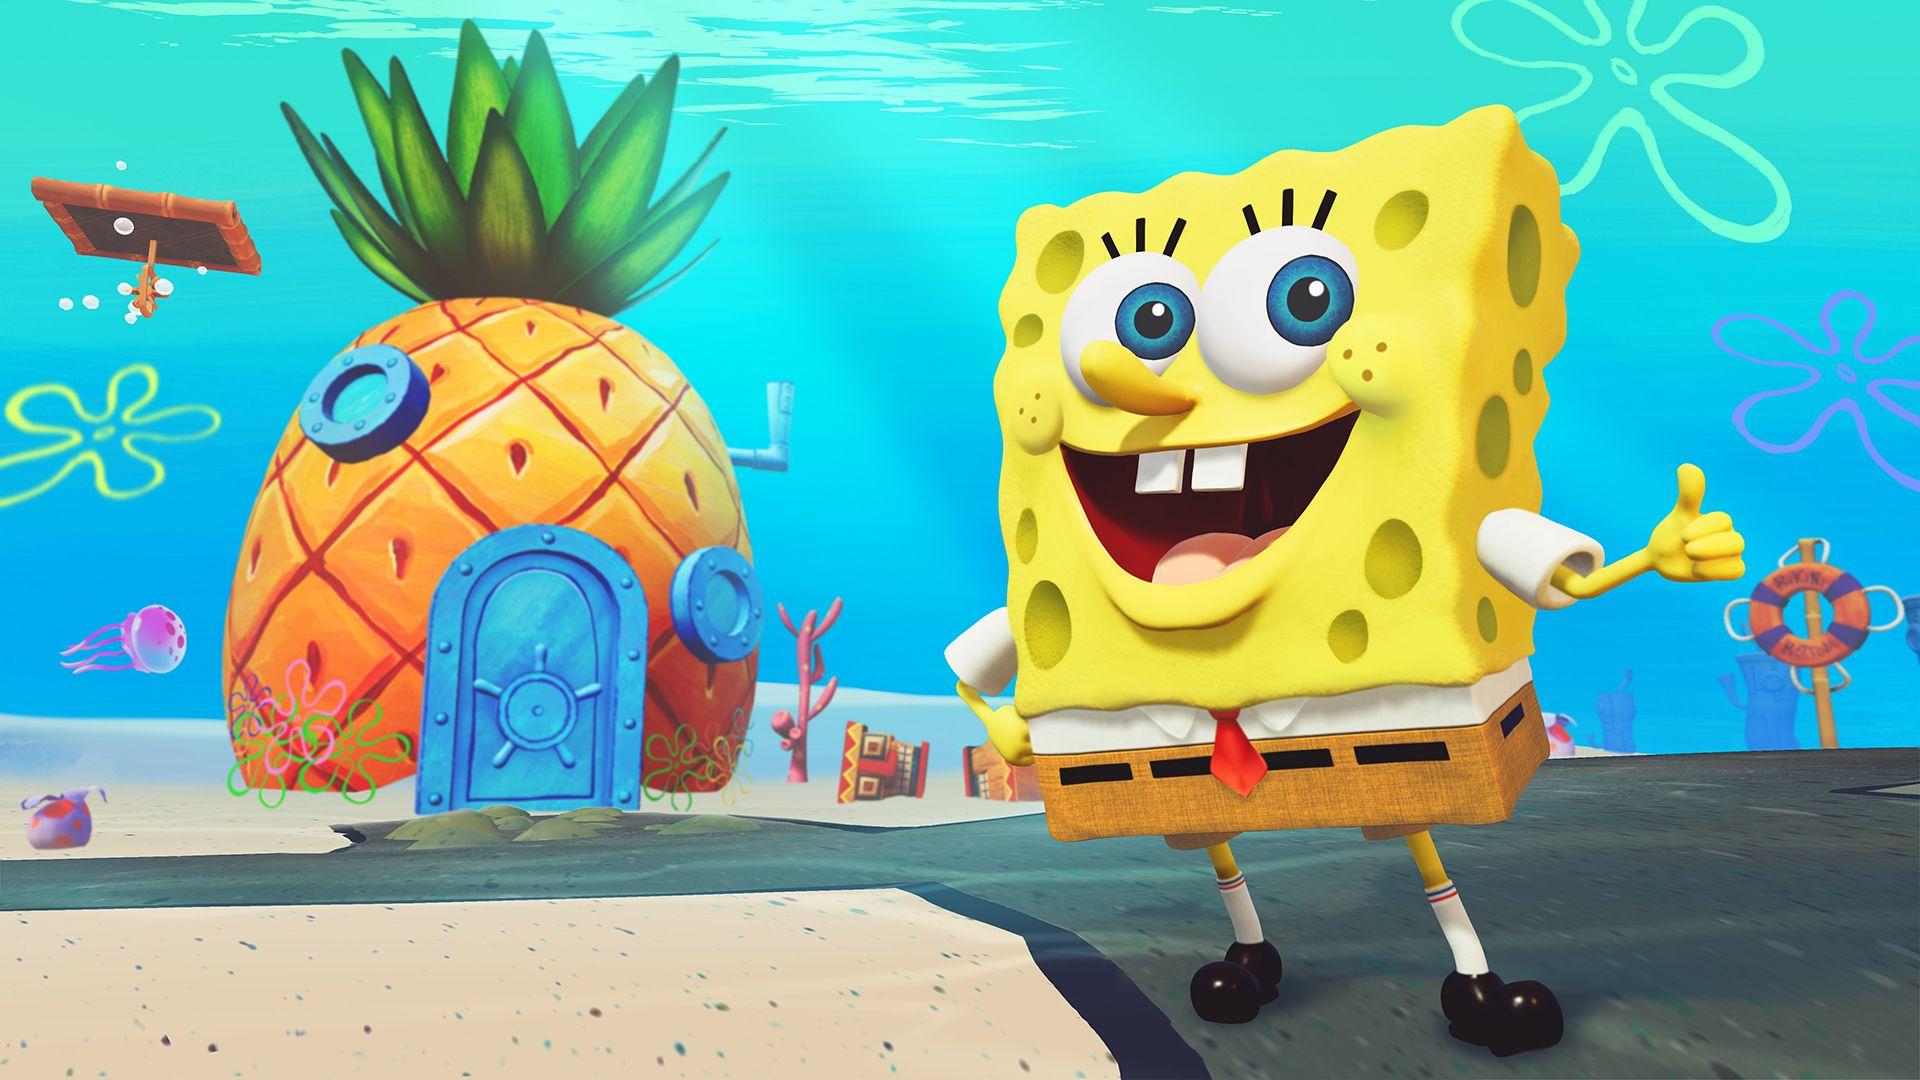 First Gameplay For Spongebob Squarepants Battle For Bikini Bottom Rehydrated Spongebob Squarepants Spongebob Squarepants